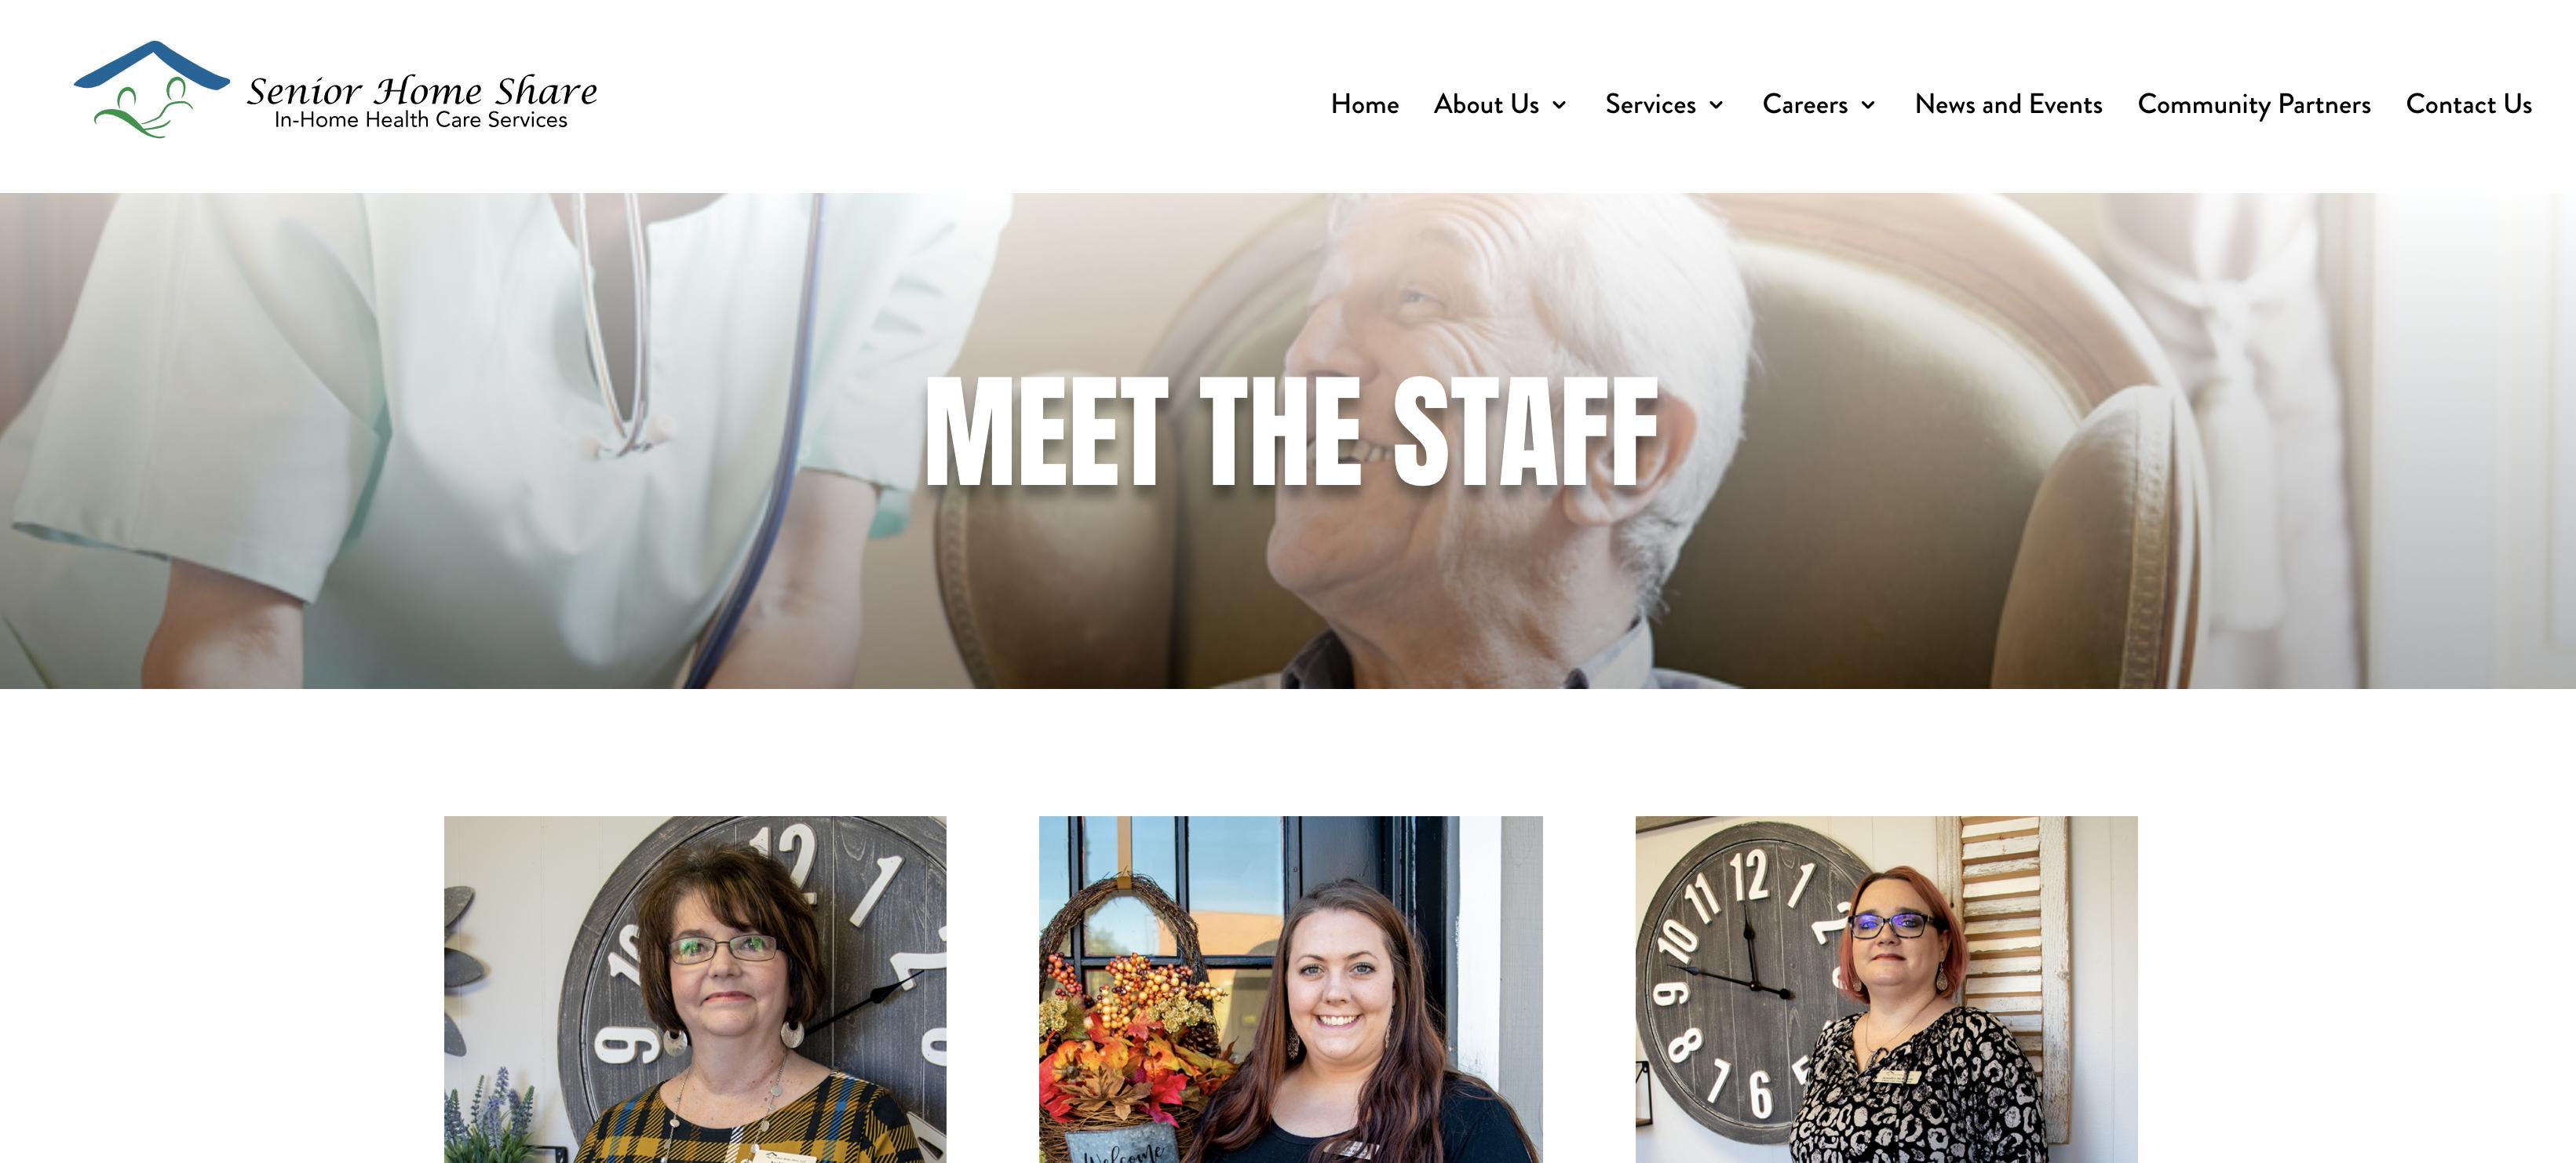 Meet the Staff - Senior Home Share